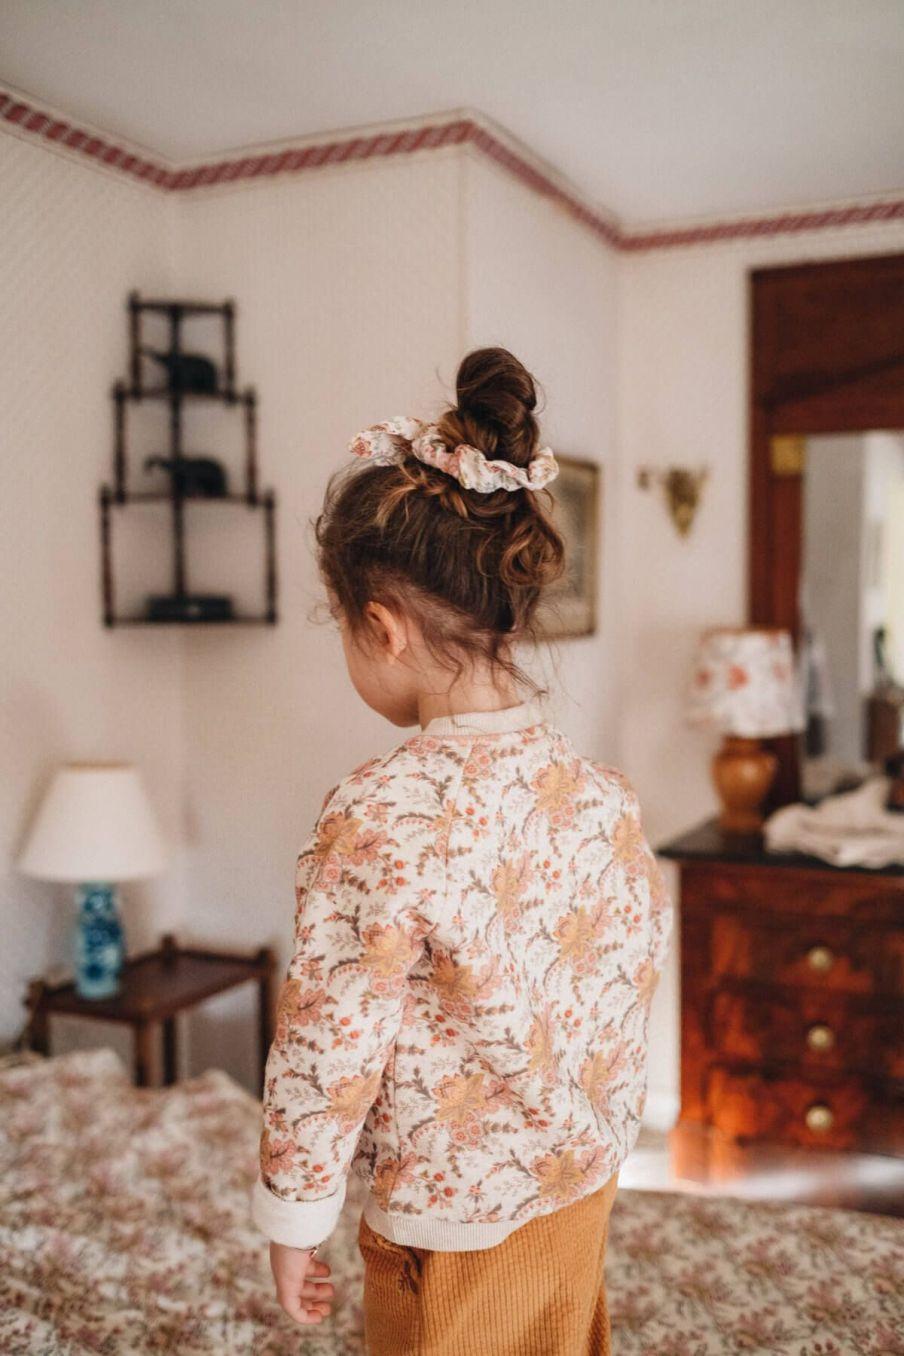 chouchou fille chloe cream french flowers - louise misha